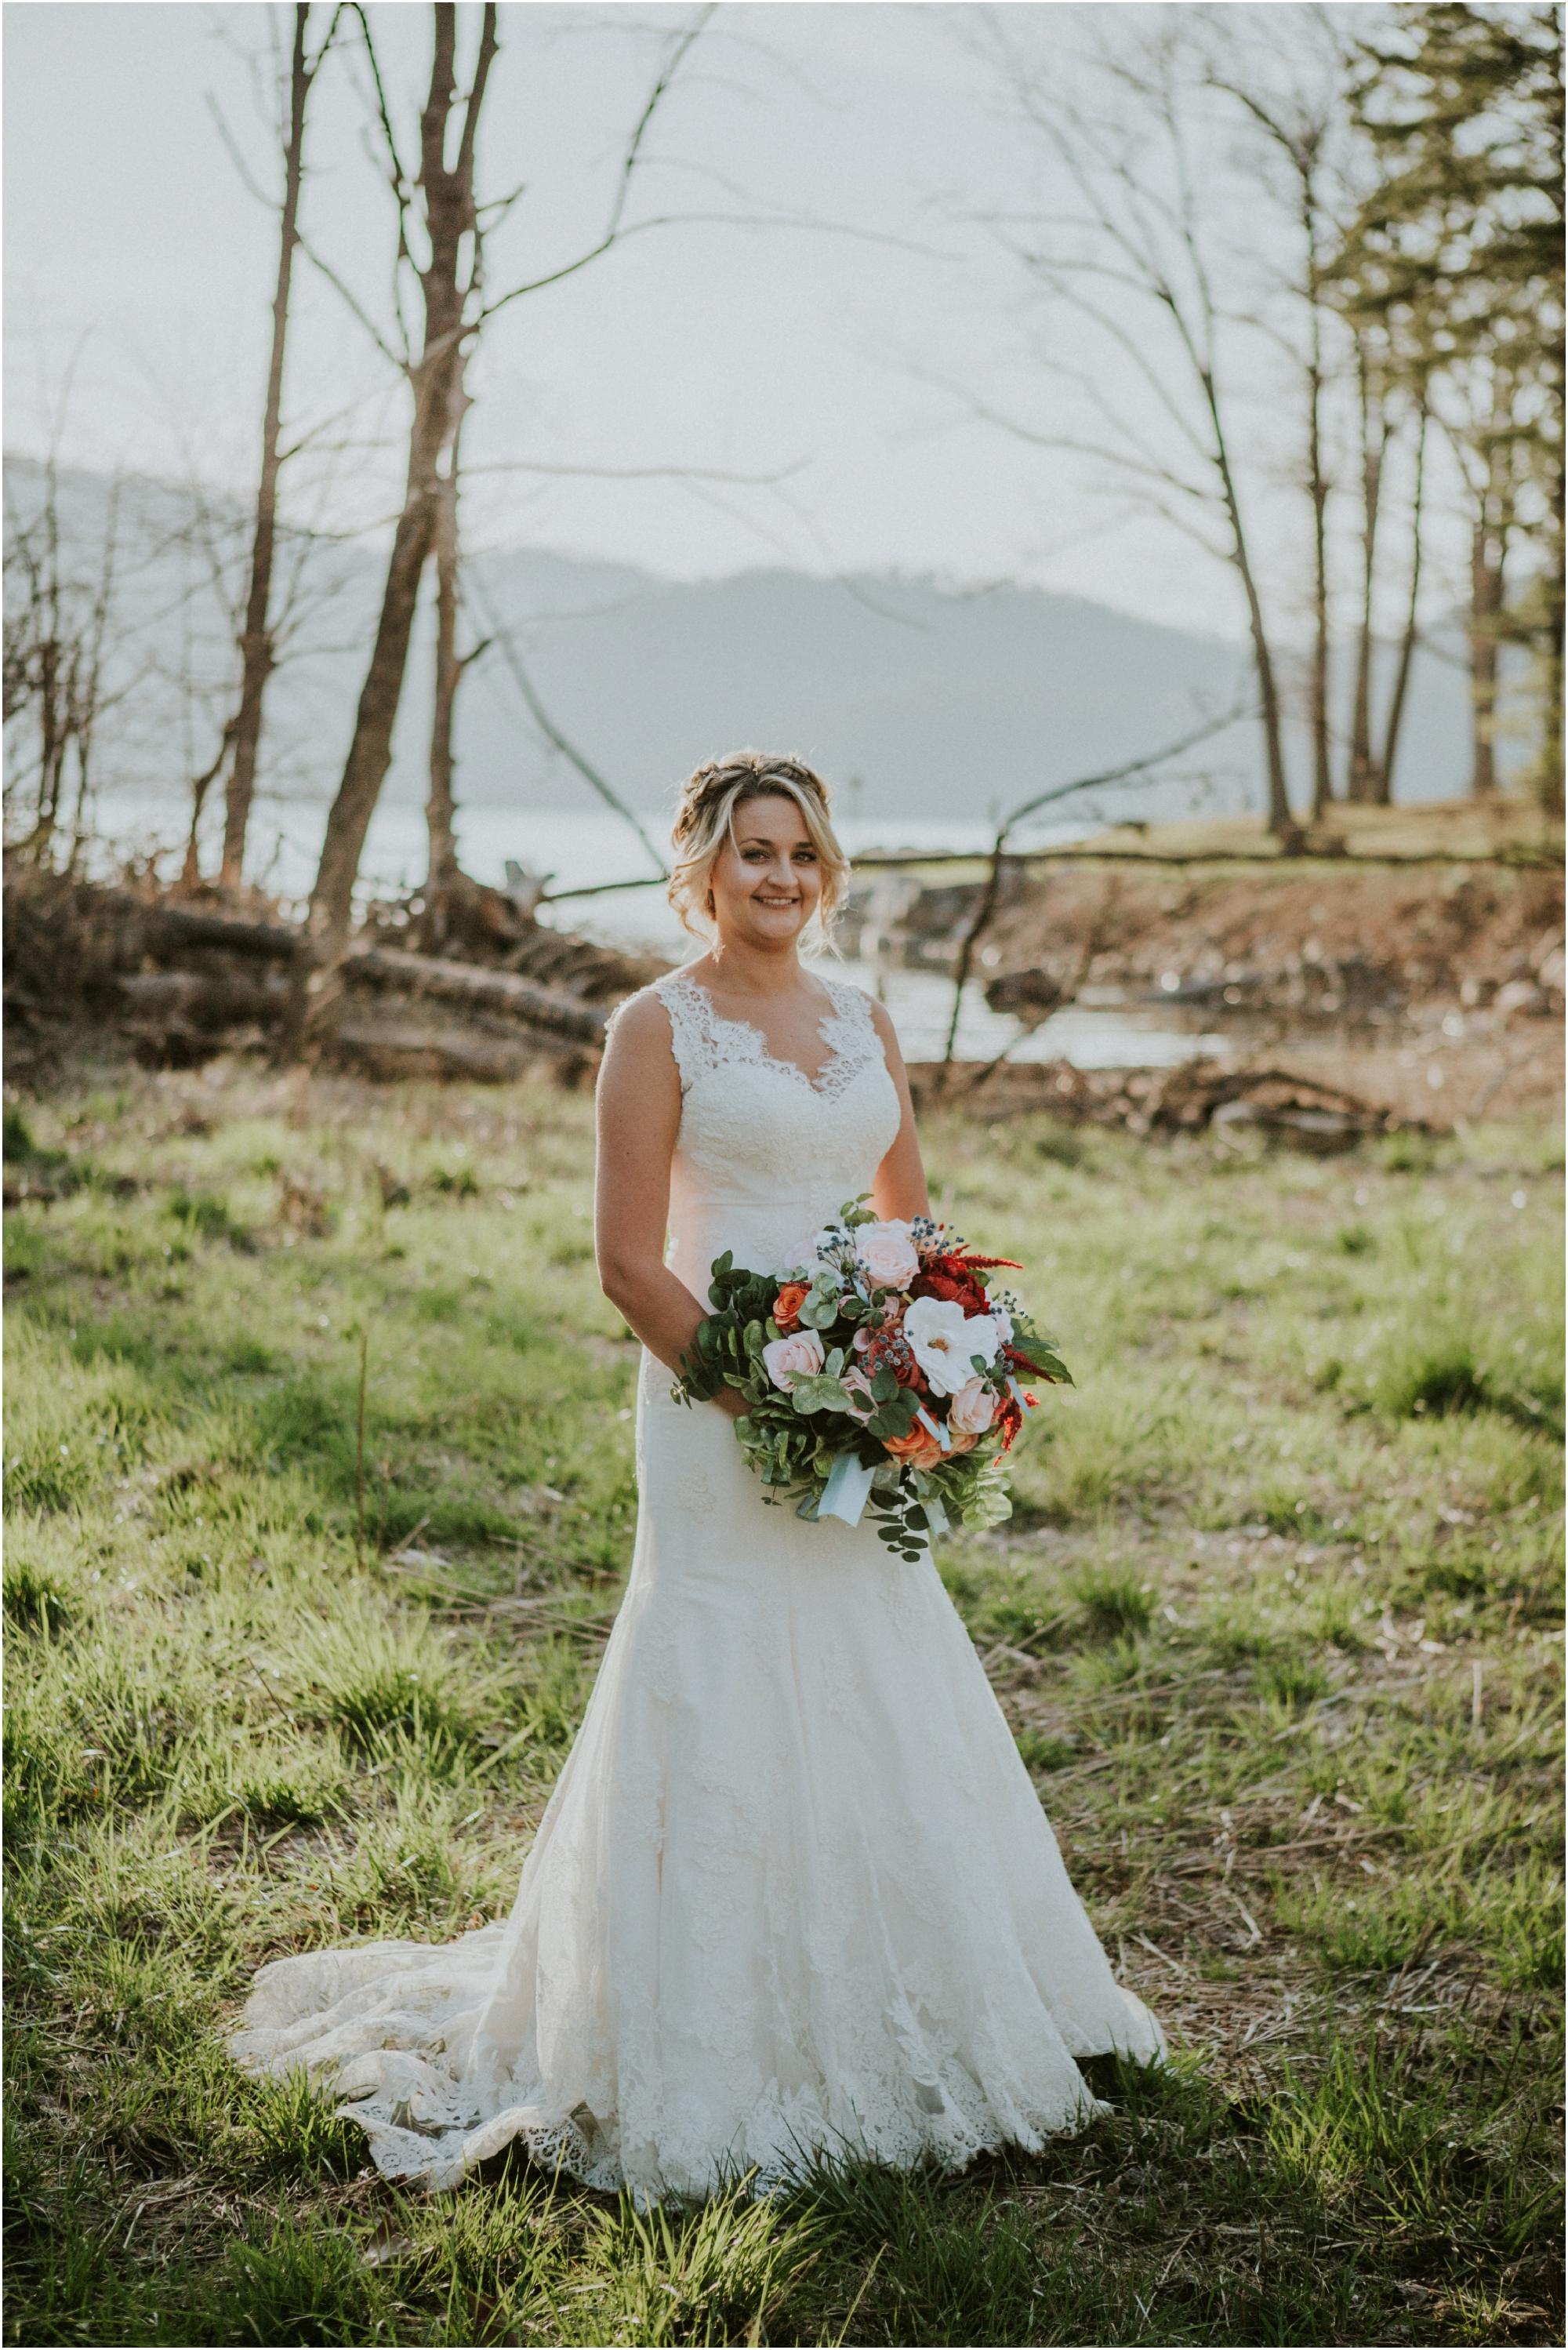 watauga-lake--bohemian-bridal-styled-session-northeast-tennessee-wedding-elopement-photography_0003.jpg